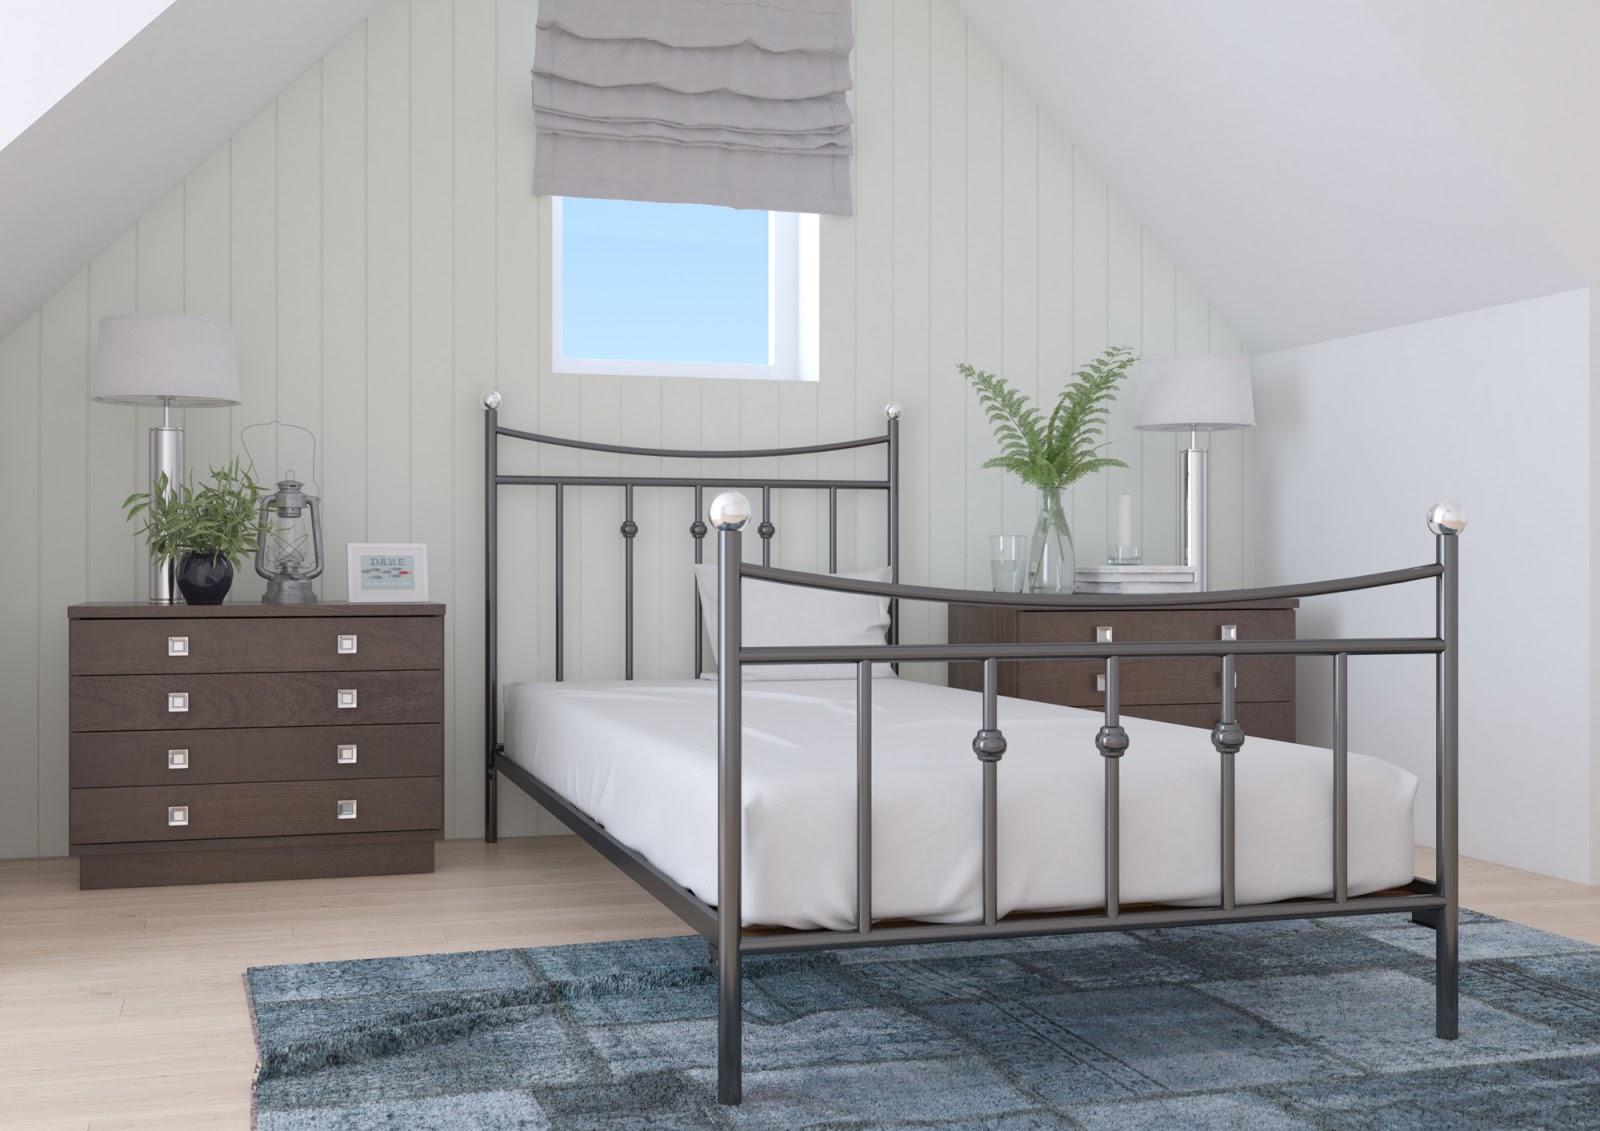 Łóżko metalowe wzór 26